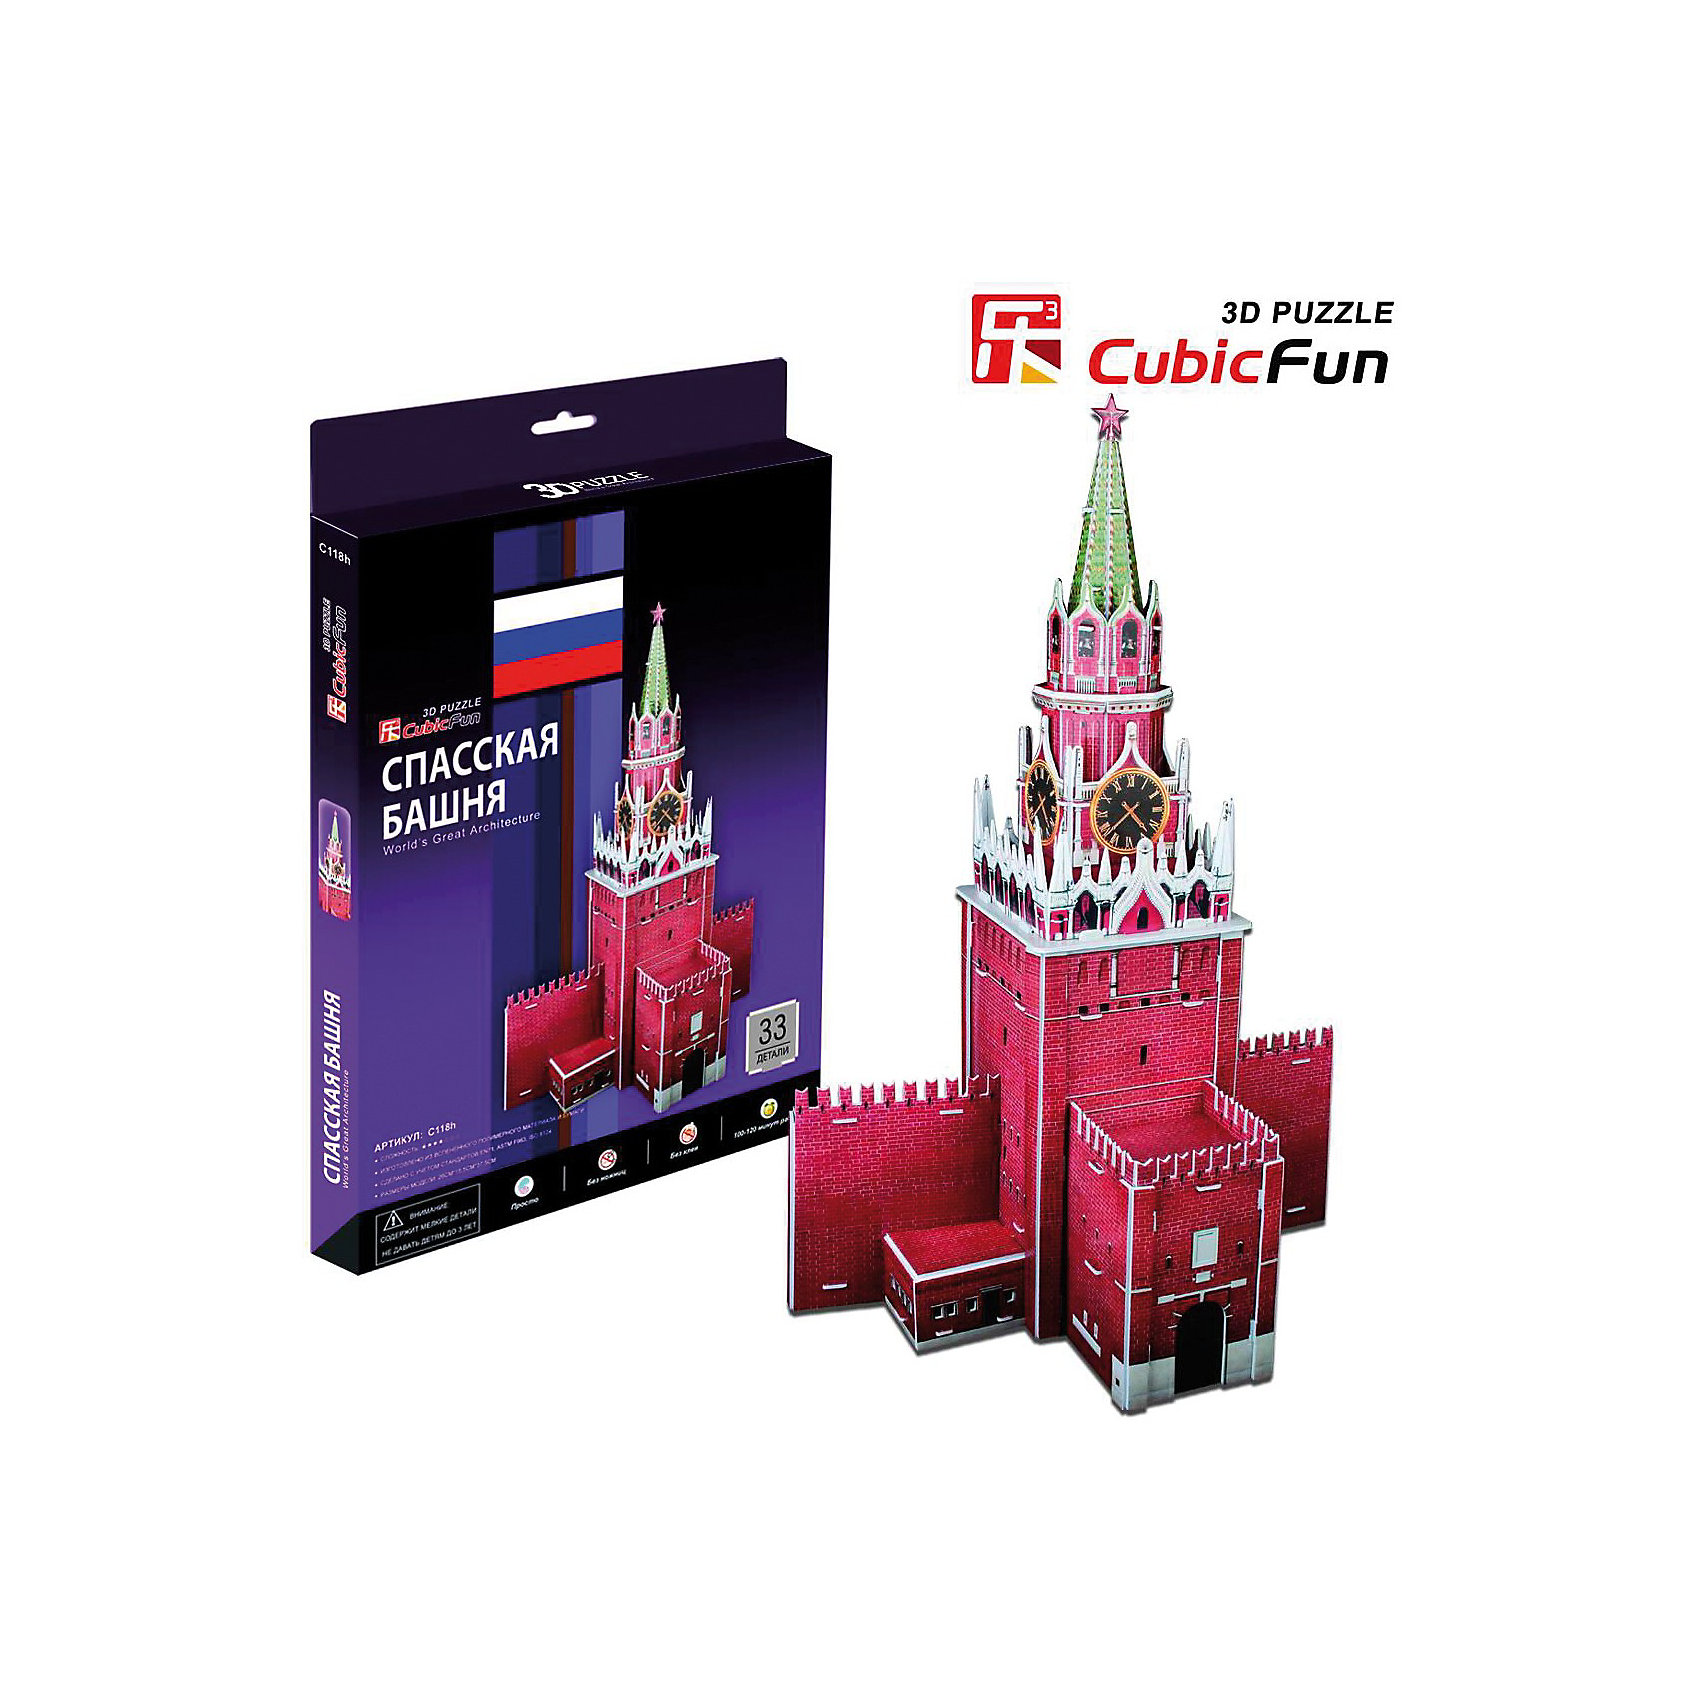 CubicFun Пазл 3D Спасская башня, 33 детали, CubicFun cubicfun 3d пазл эйфелева башня 2 франция cubicfun 33 детали